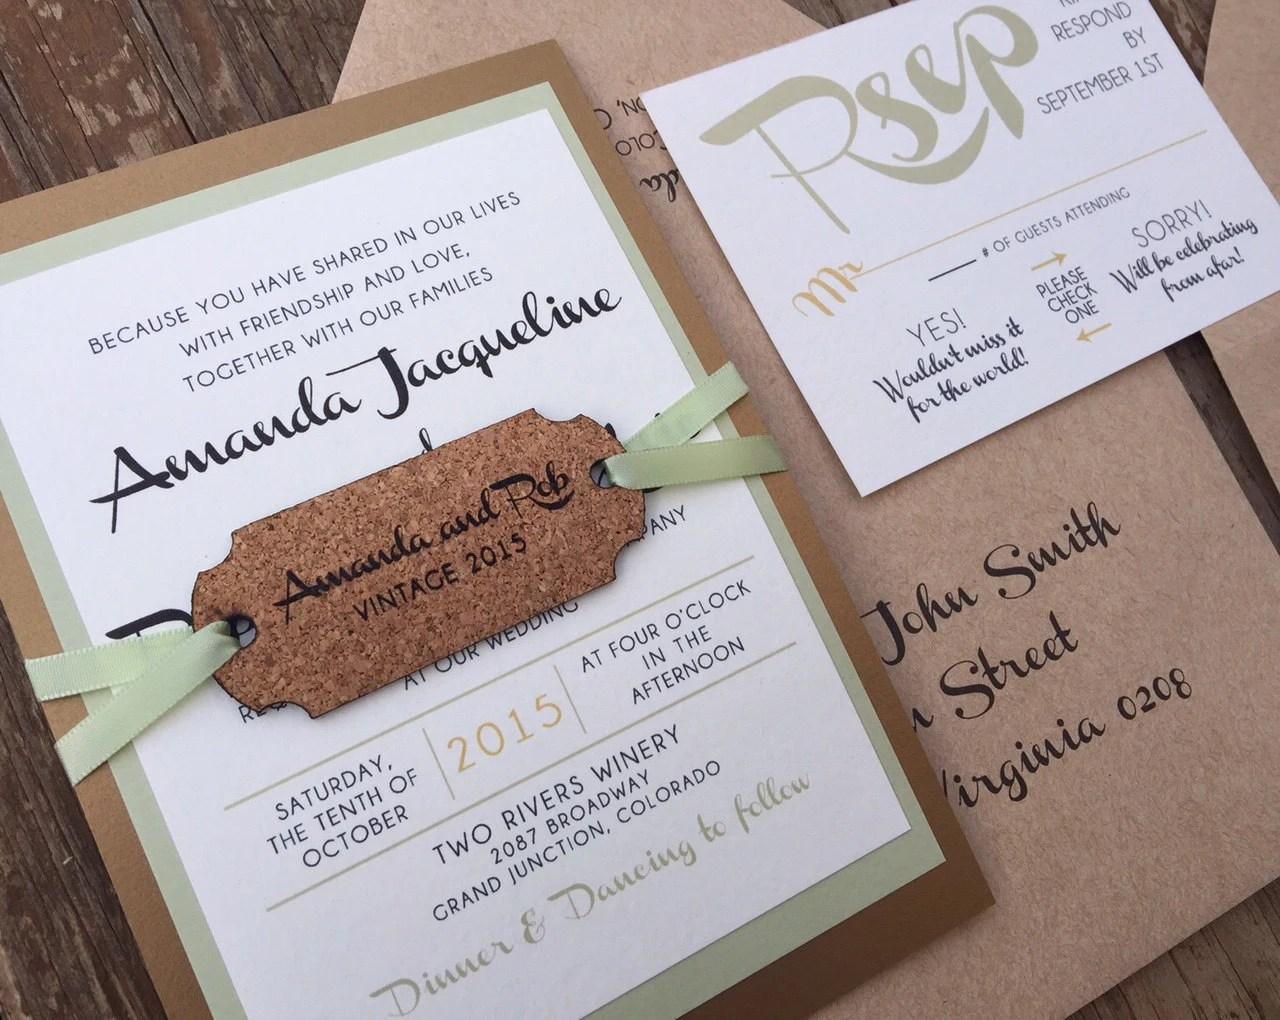 Winery Wedding Invitation With Wine Cork Tag SAMPLE